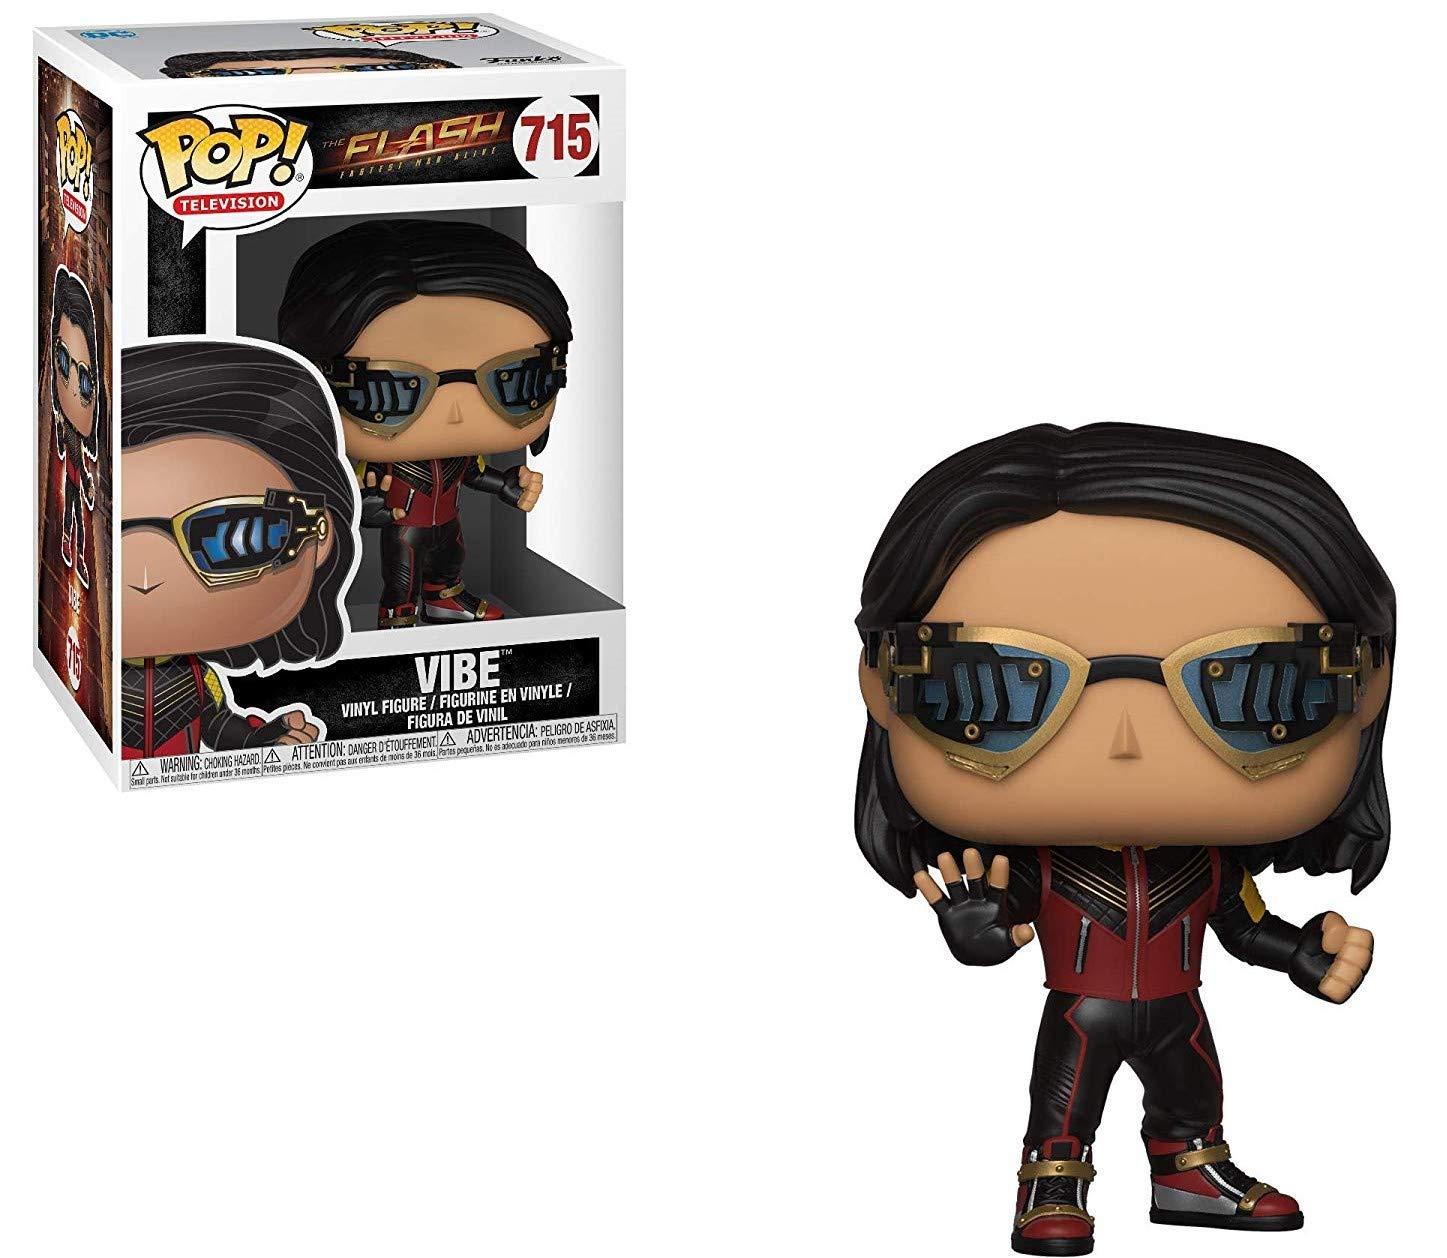 DC Comics: The Flash TV Series Includes Pop Box Protector Case Vibe Vinyl Figure Funko Pop